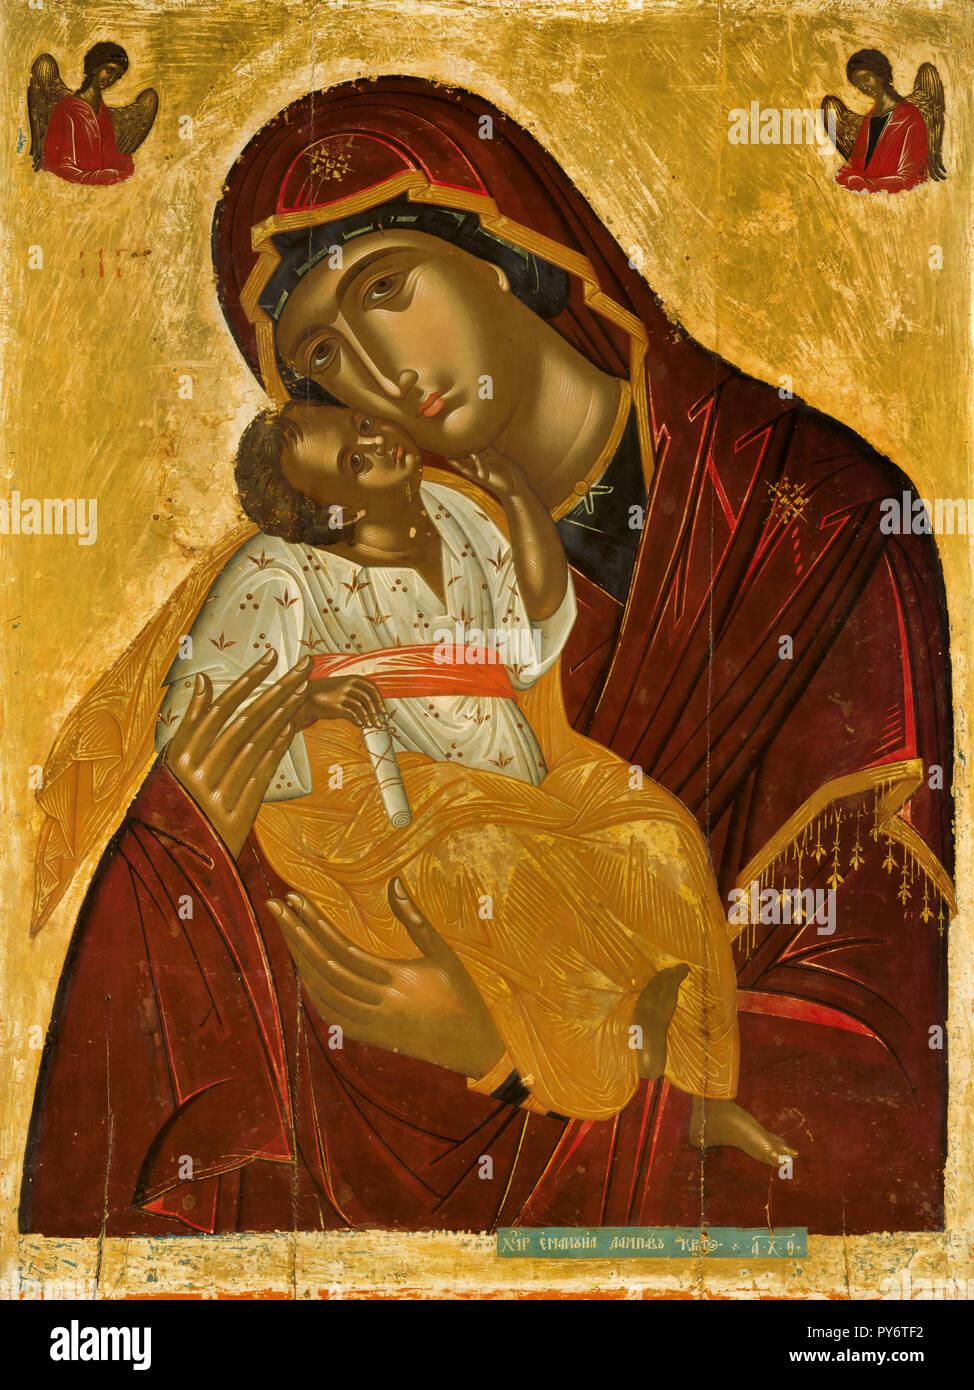 Emmanuel Lambardos, La Virgen de la Ternura 1609 Icono, óleo sobre panel, Museo Benaki, en Atenas, Grecia. Imagen De Stock